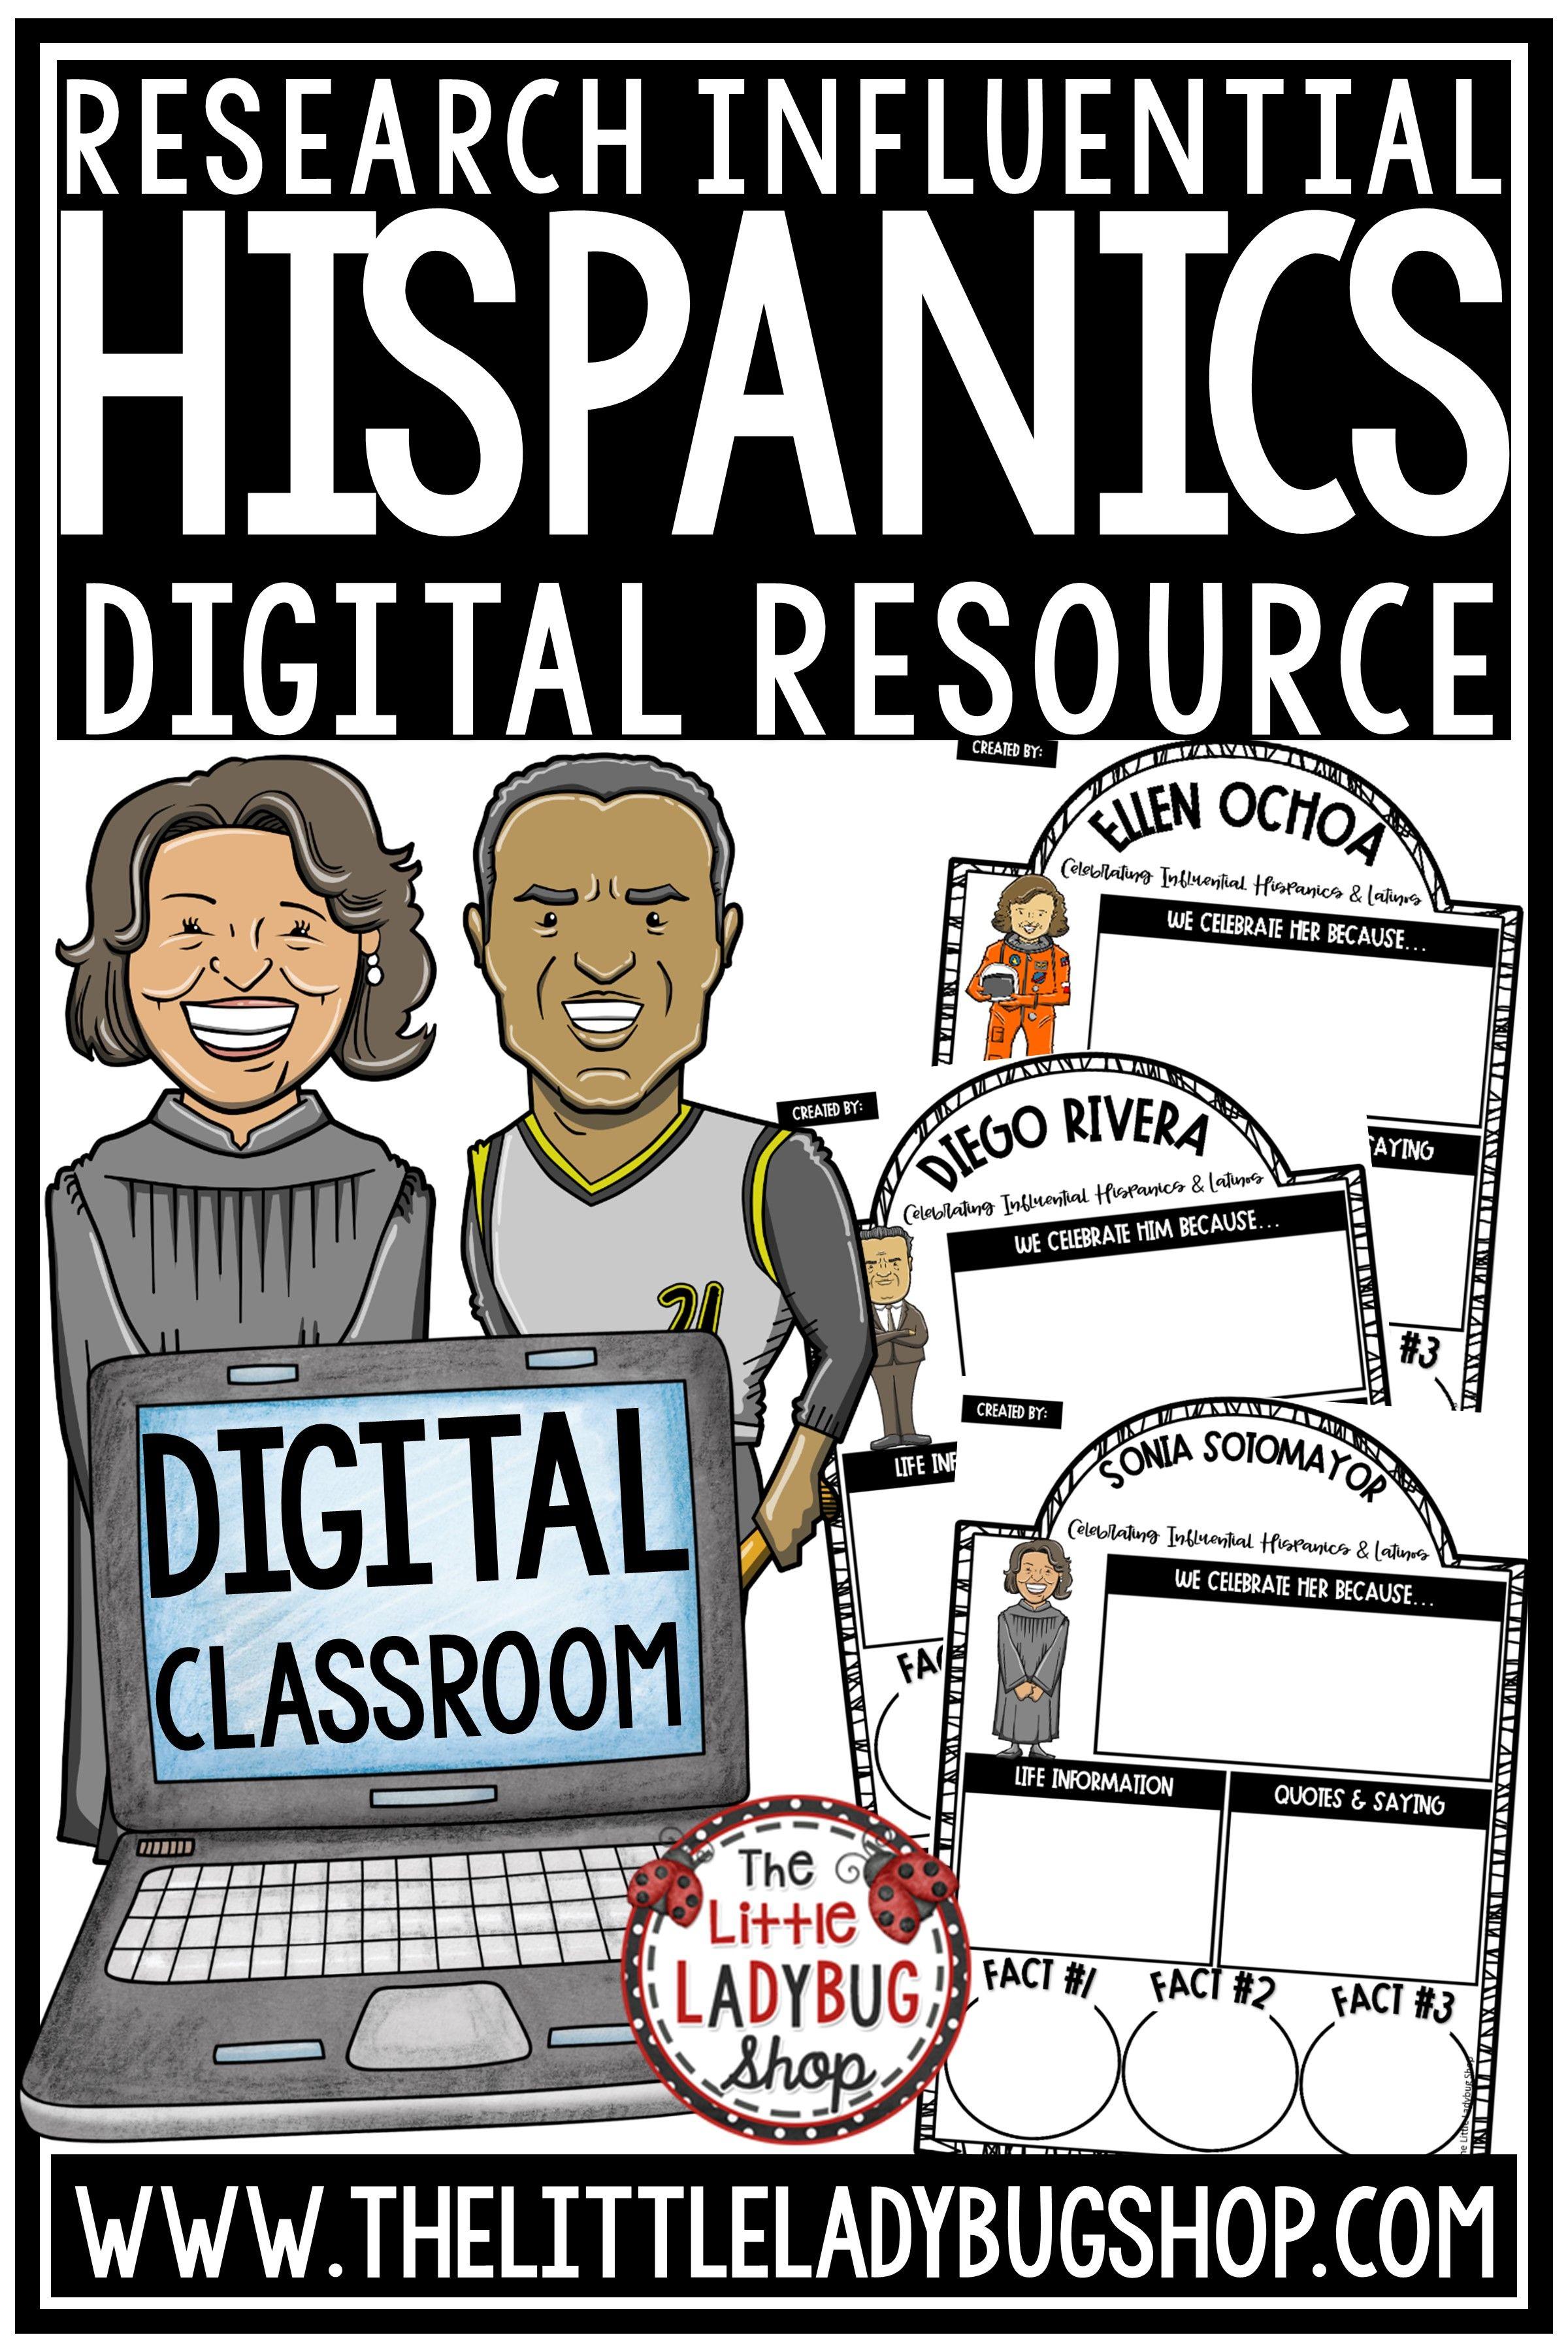 Digital Resource Influential Hispanic Heritage Month